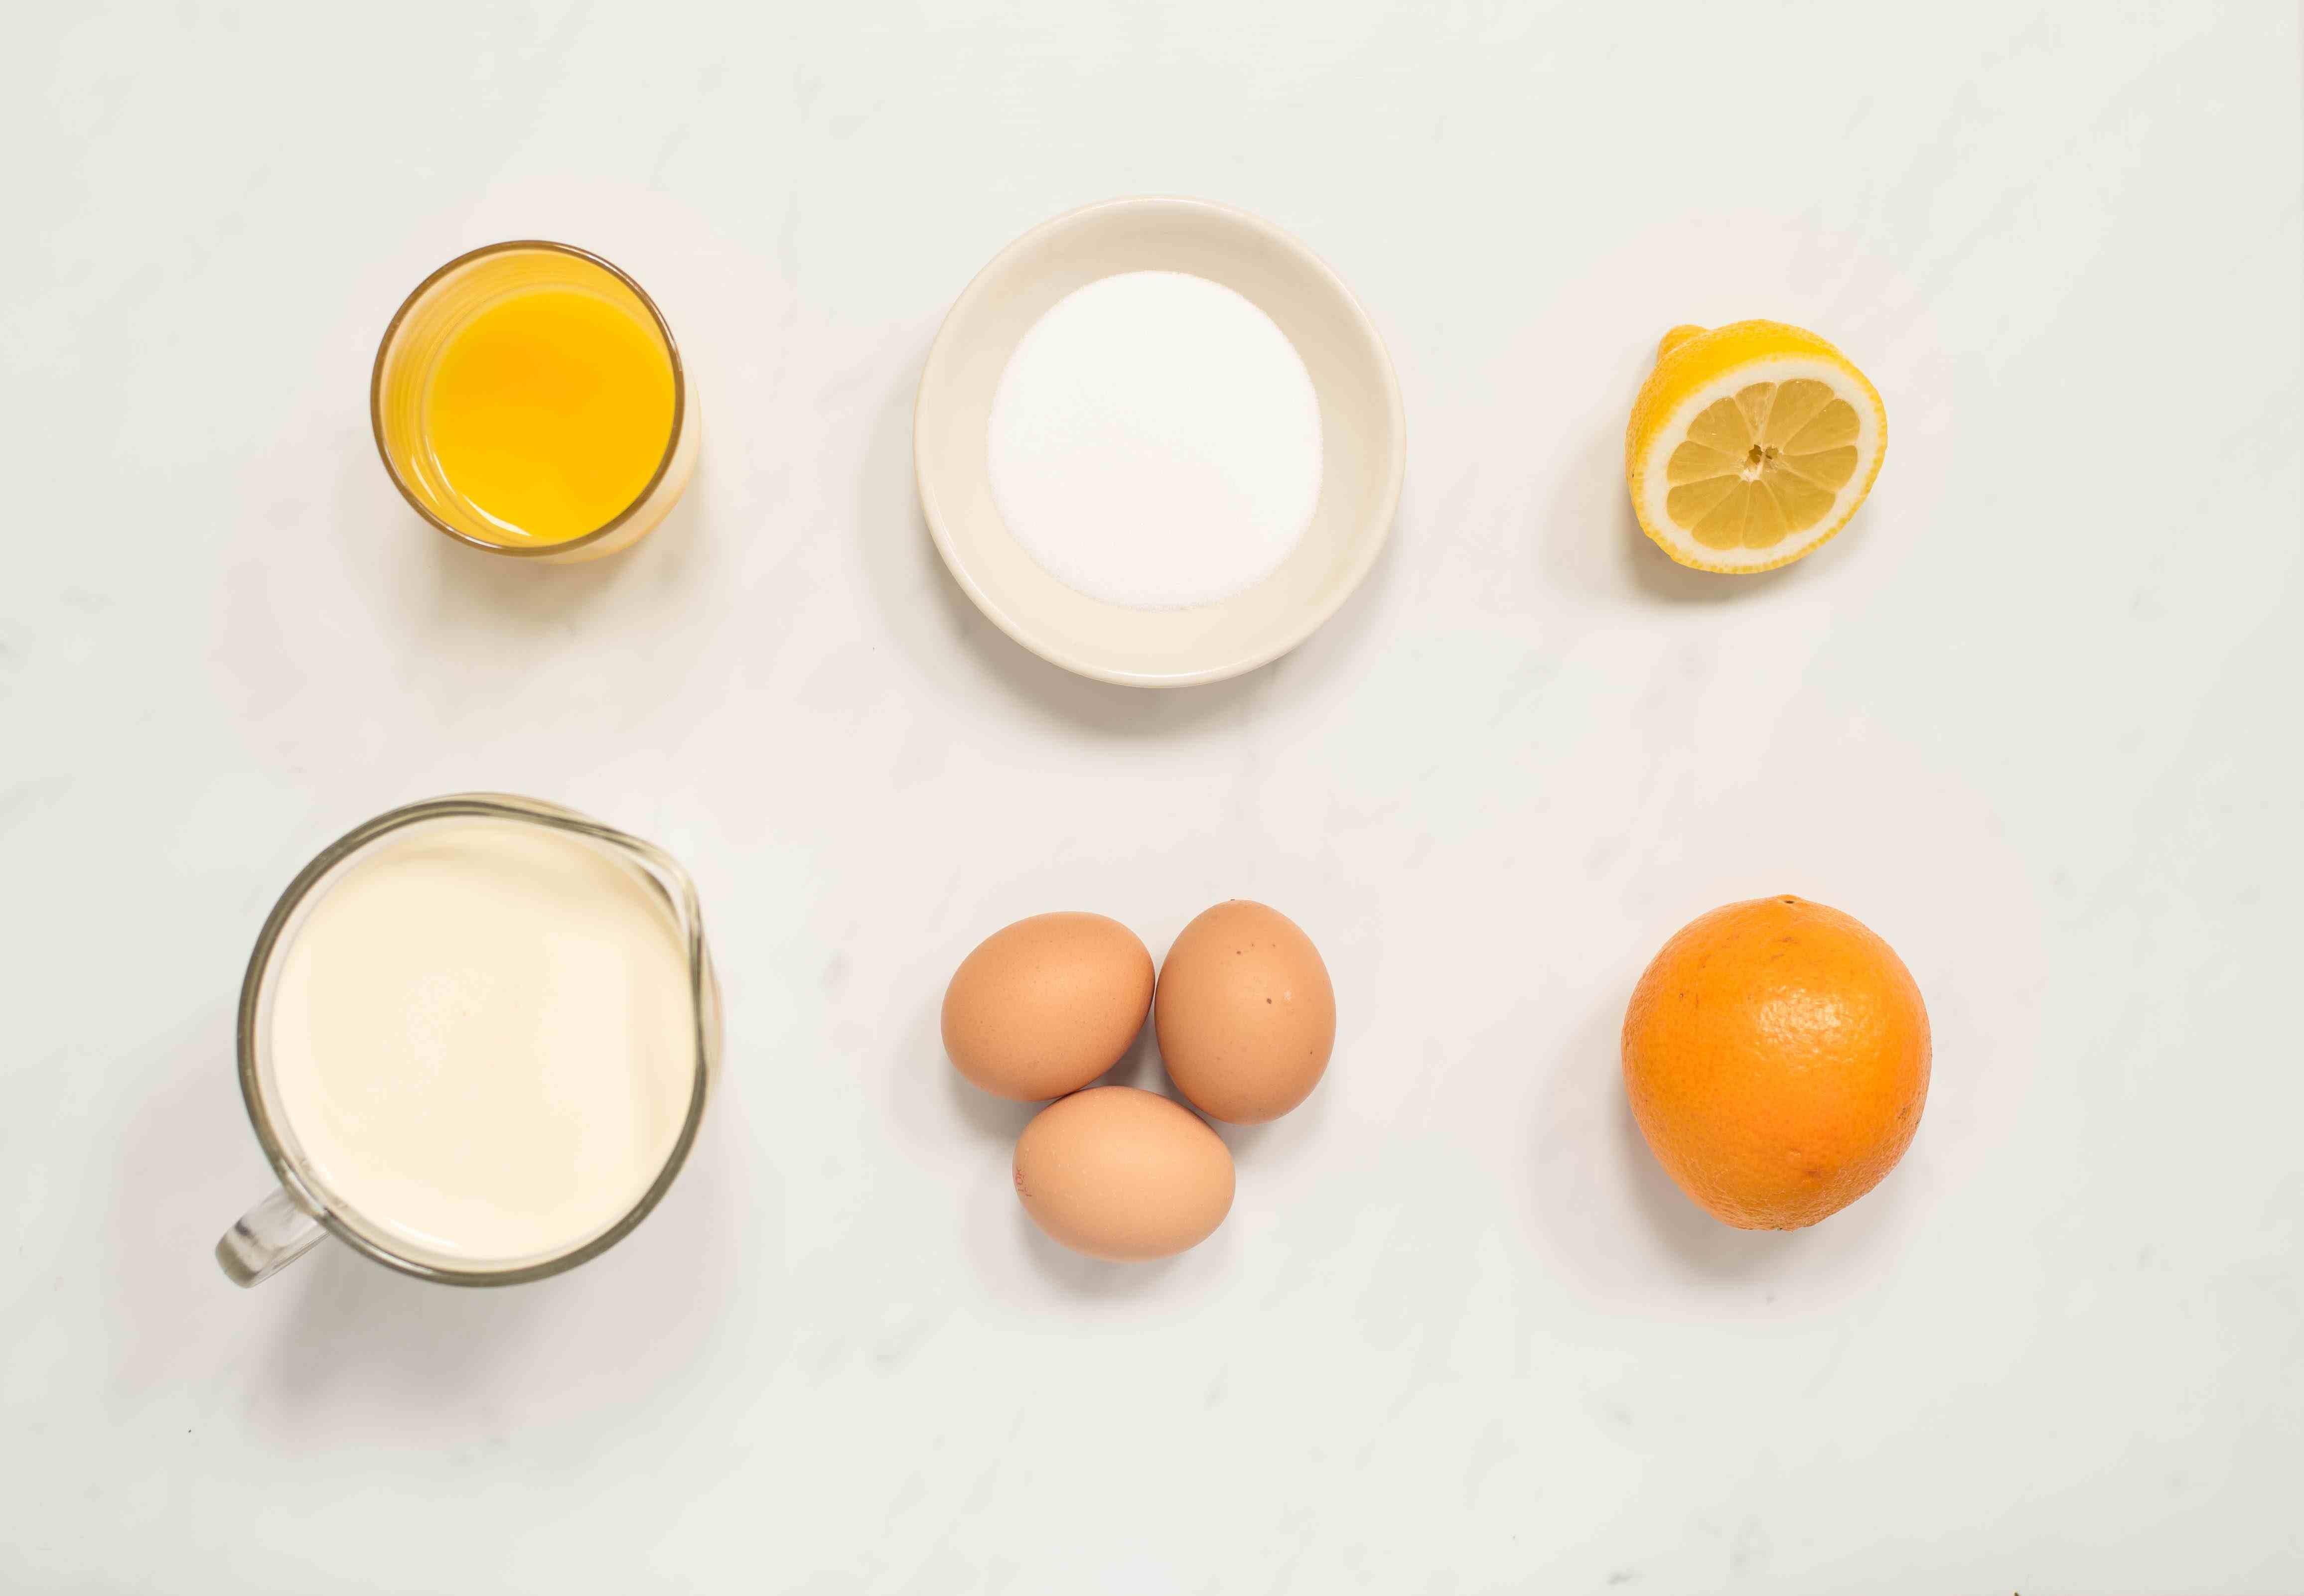 Ingredients for custard